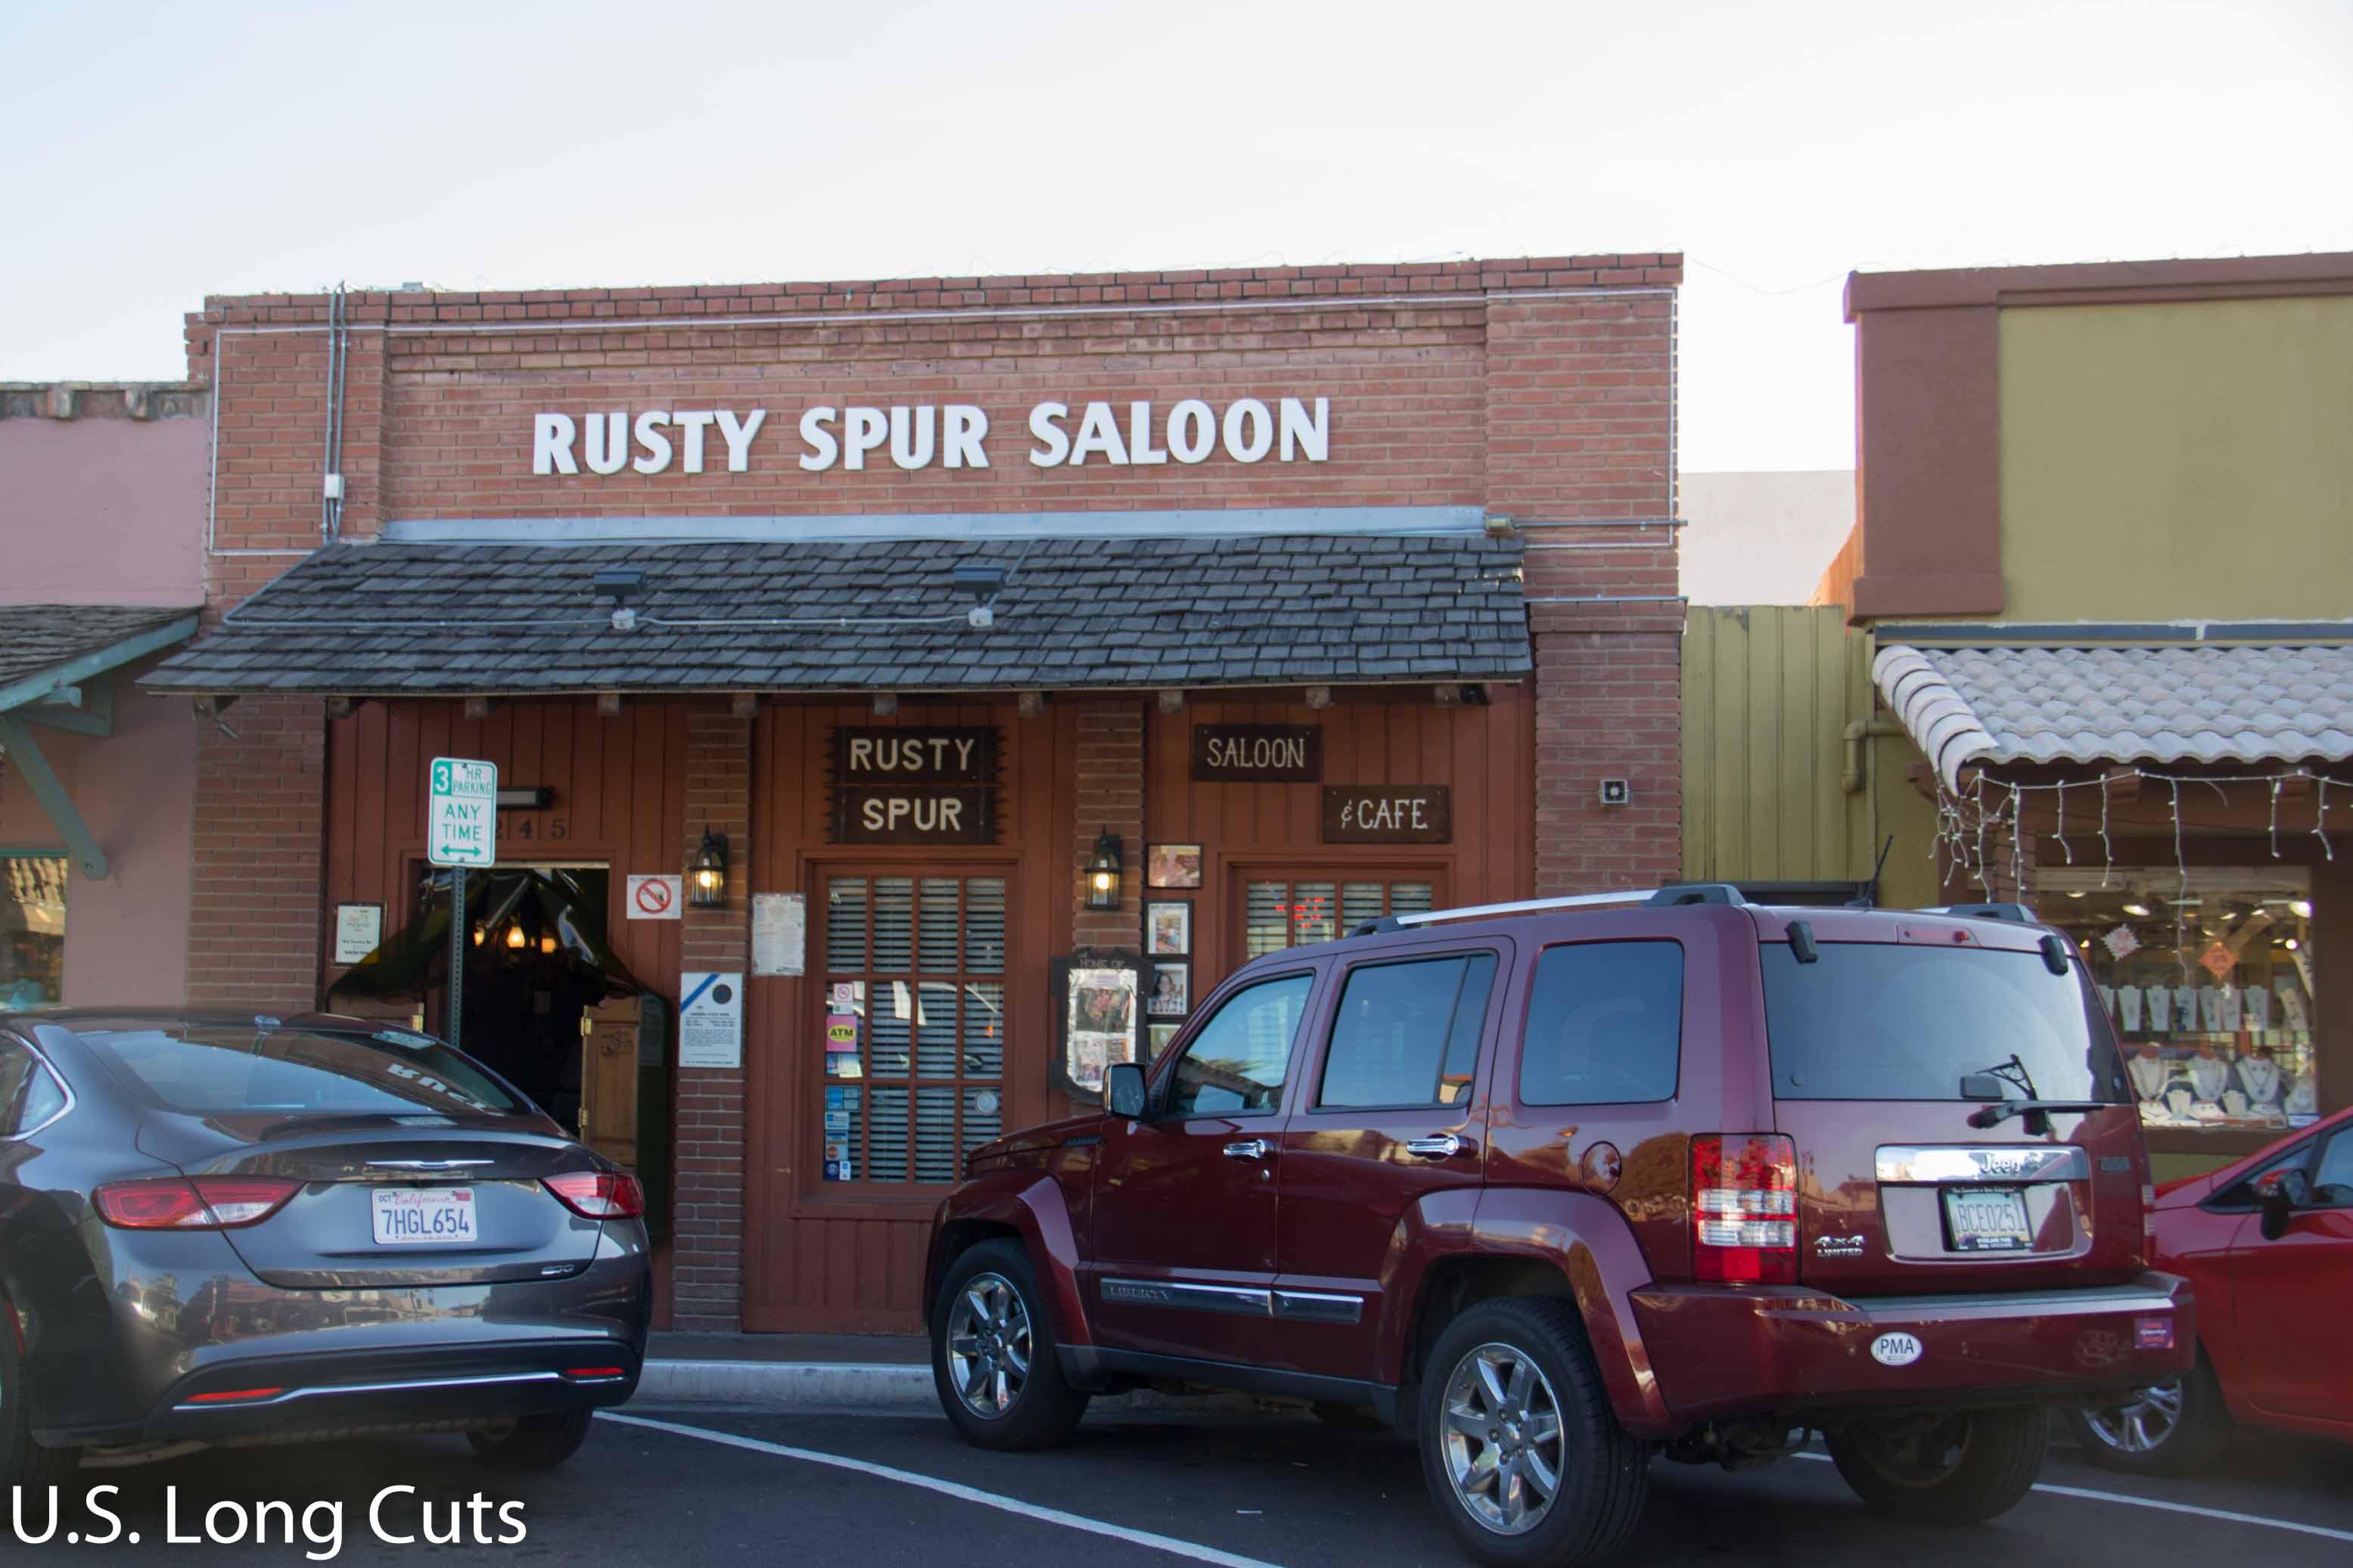 Rusty Spur Saloon exterior